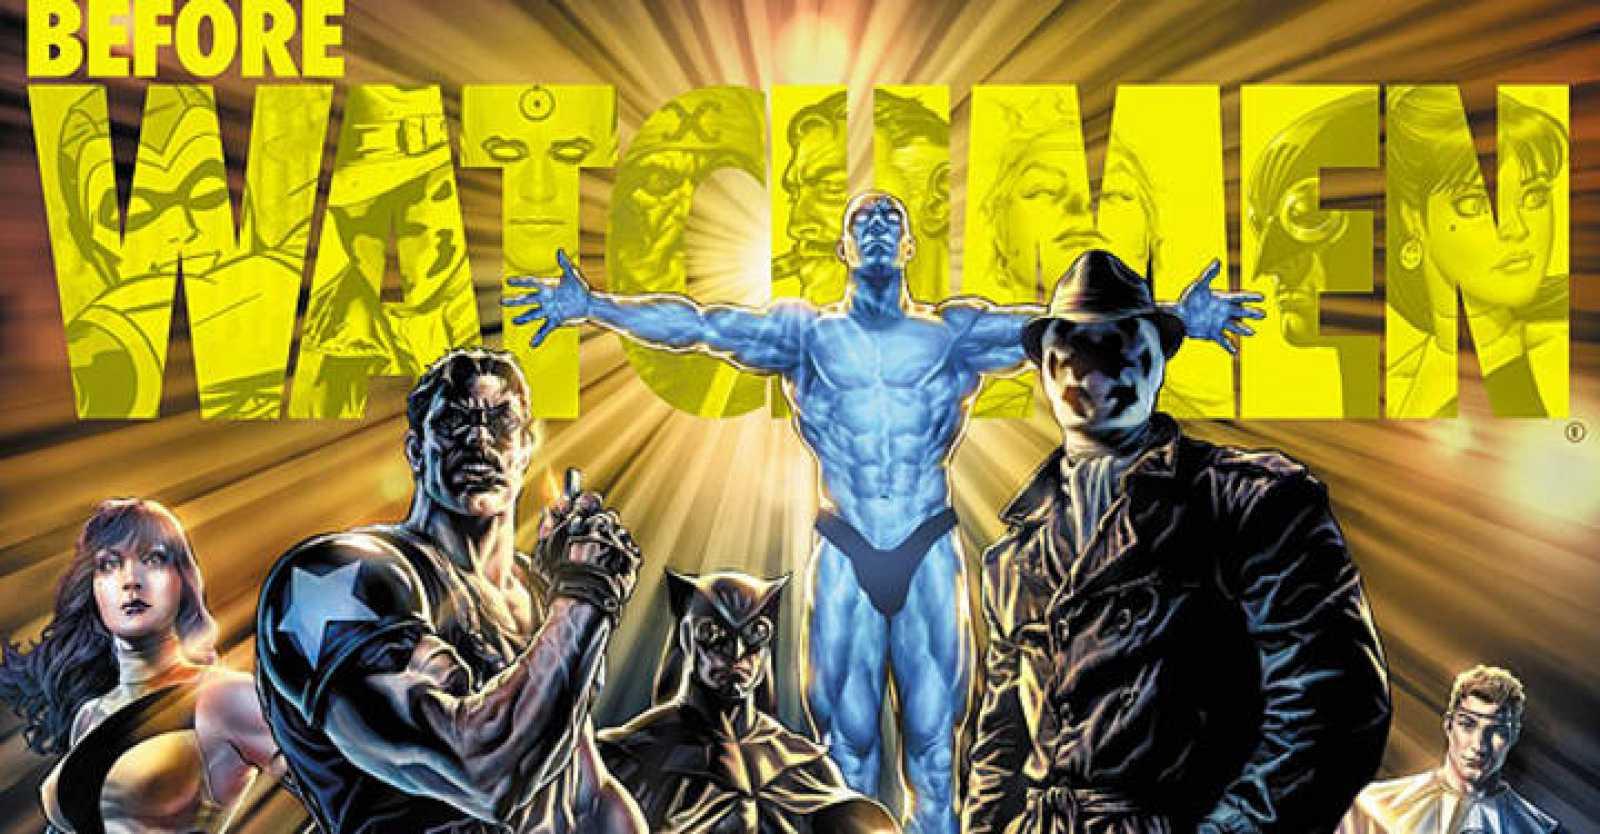 Imagen promocional de 'Before Watchmen' , de Lee Bermejo